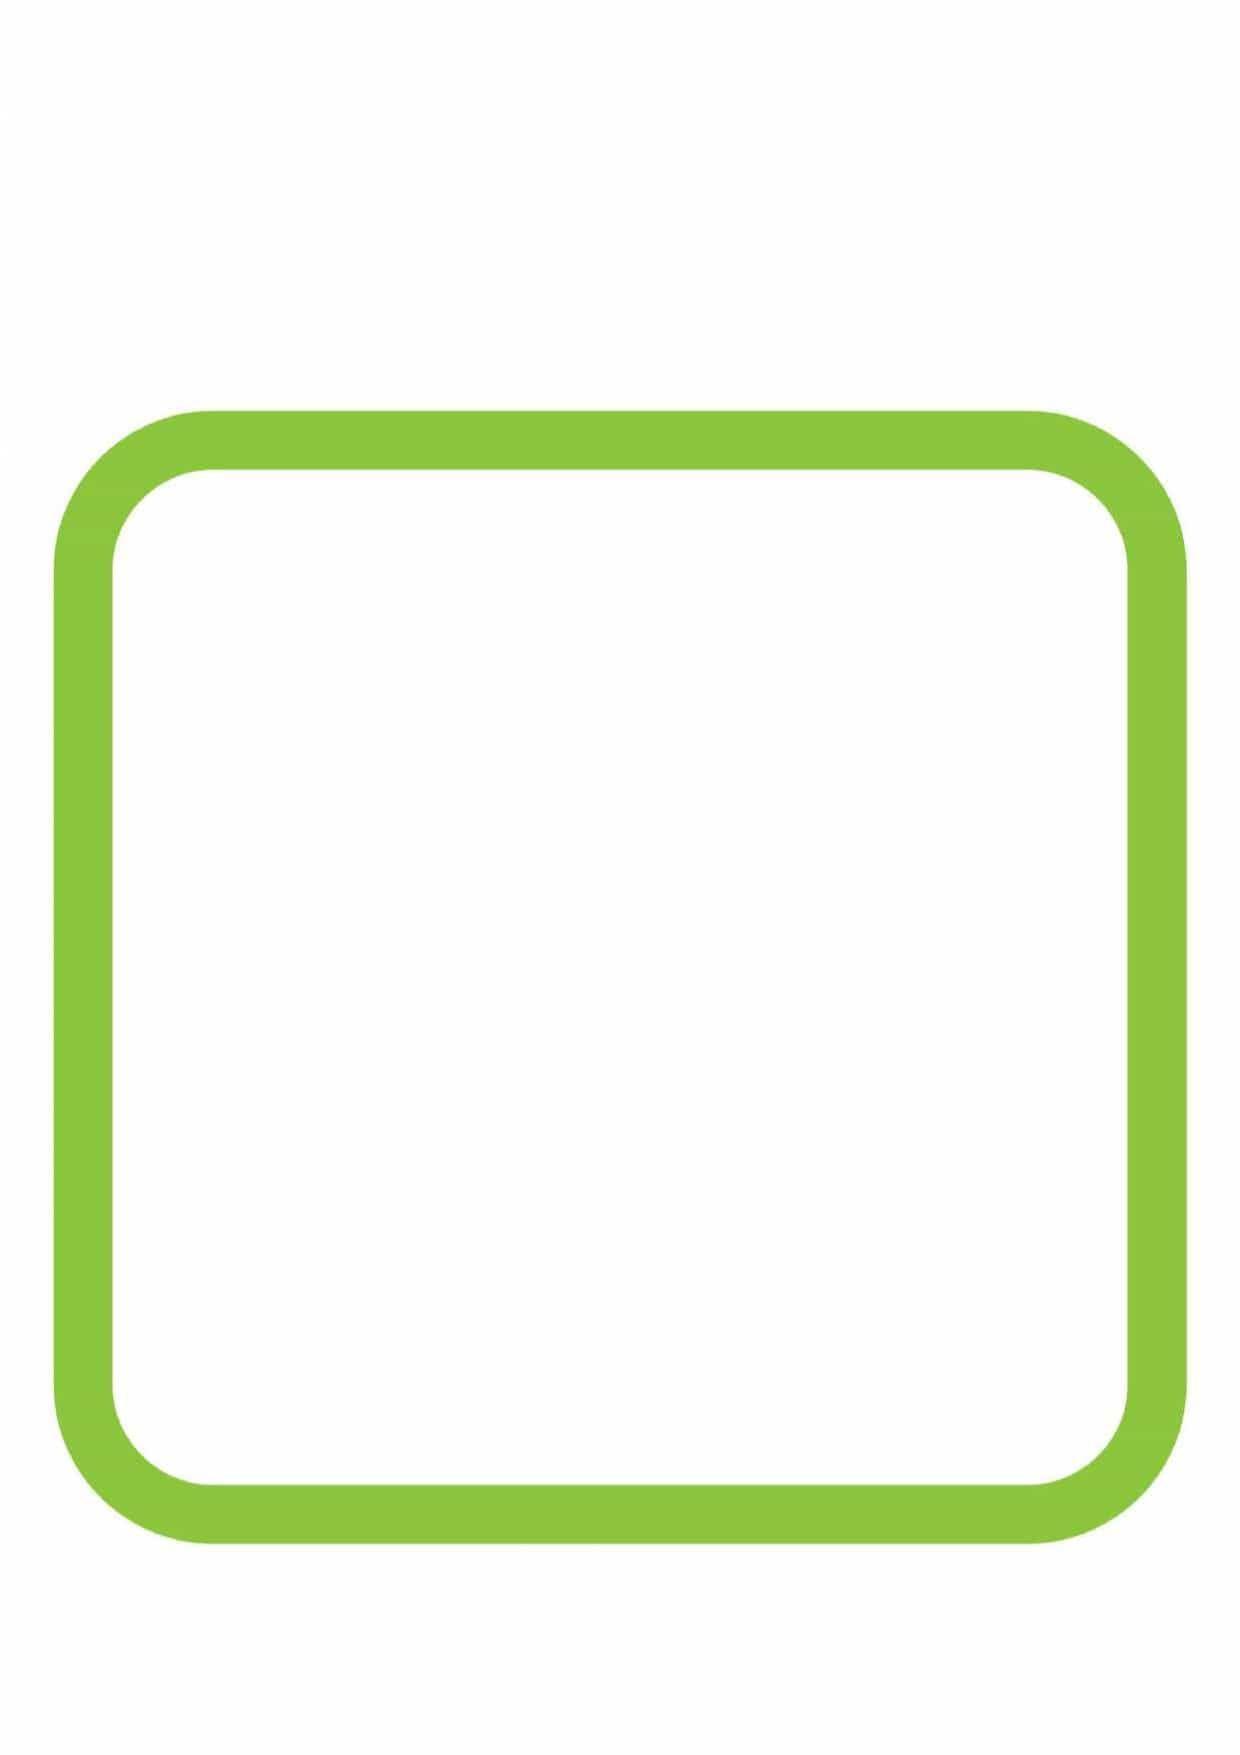 Free Downloadable Scribbling Worksheets For Kids